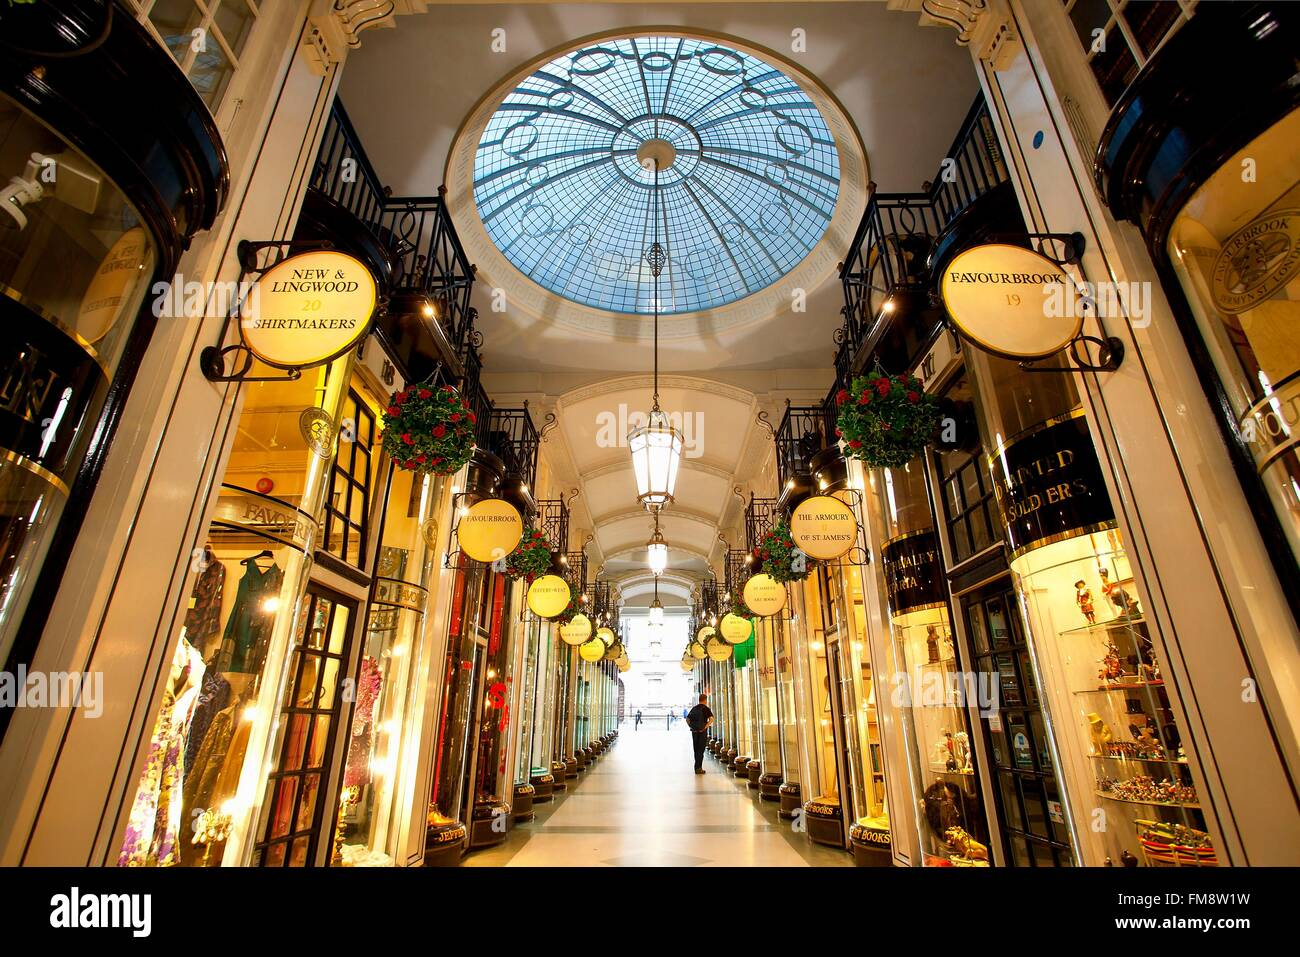 United Kingdom, London, Piccadilly Arcade - Stock Image